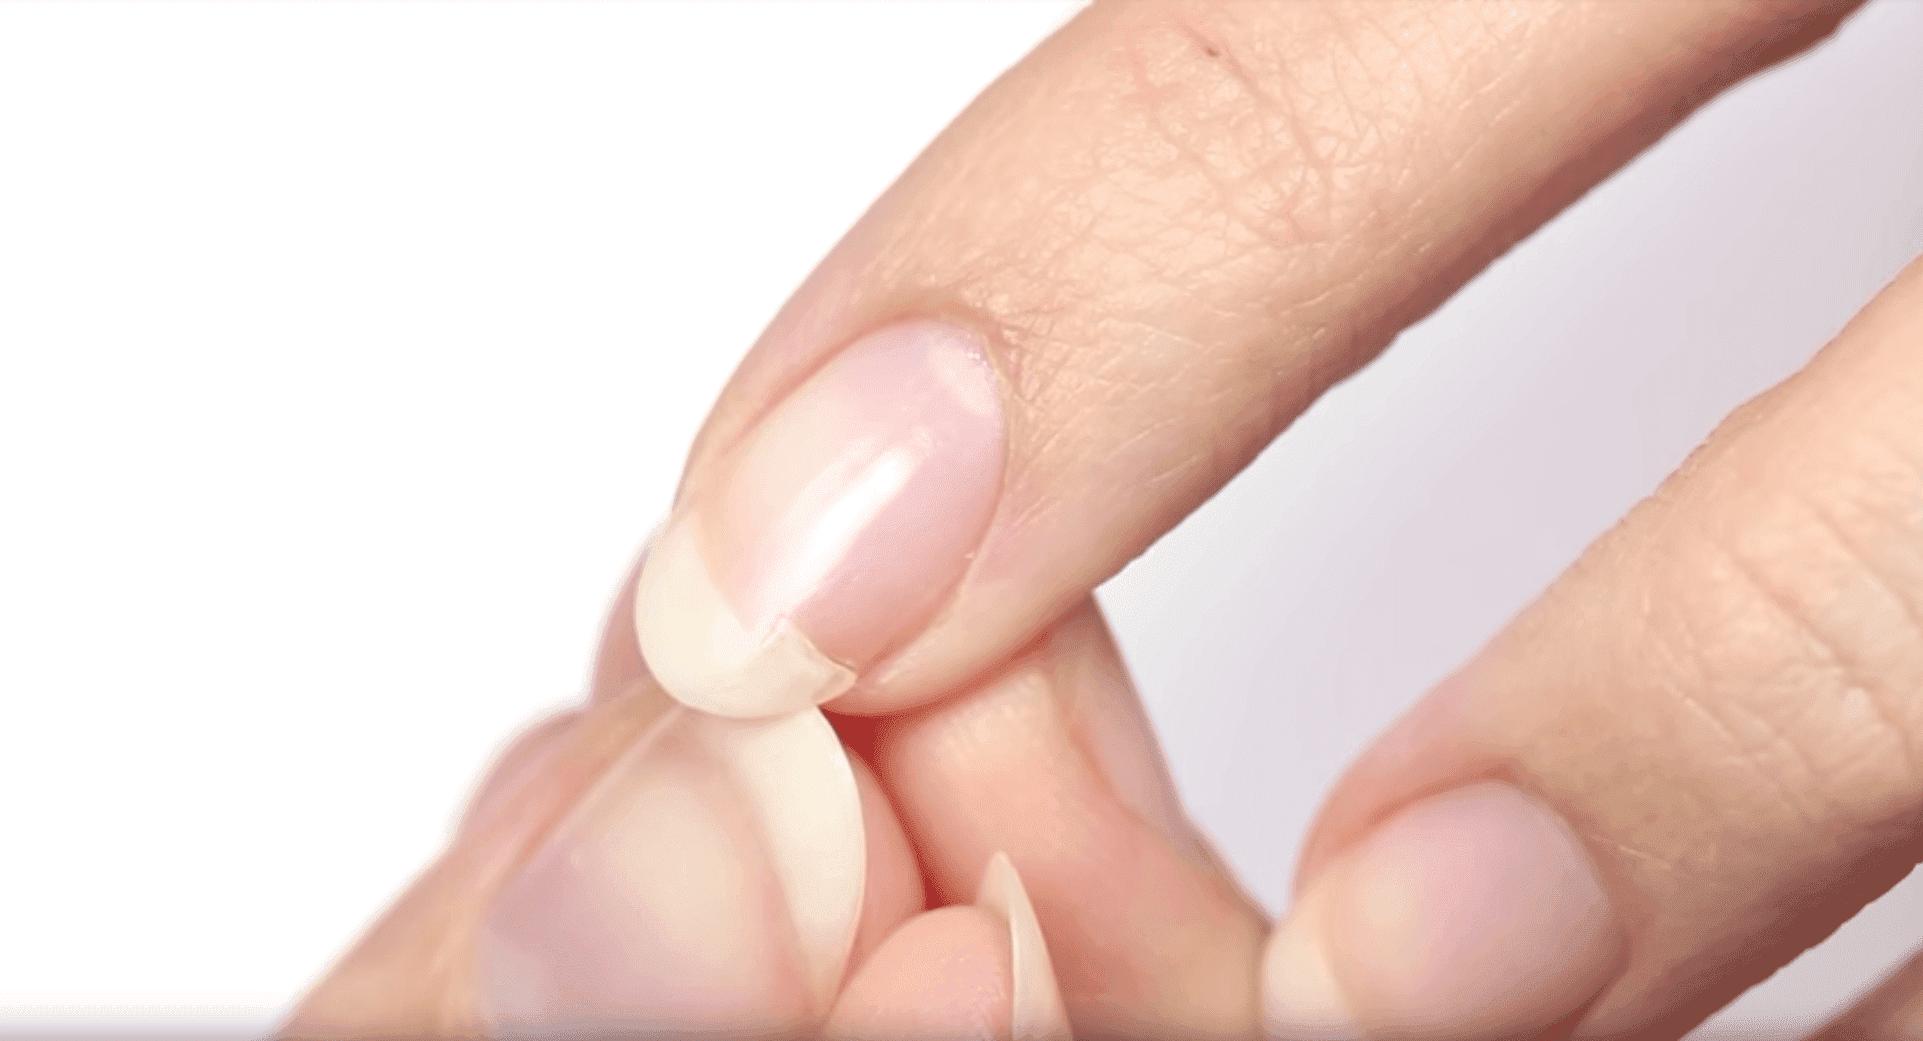 A broken nail. I Image: YouTube/ HannahRoxNails.